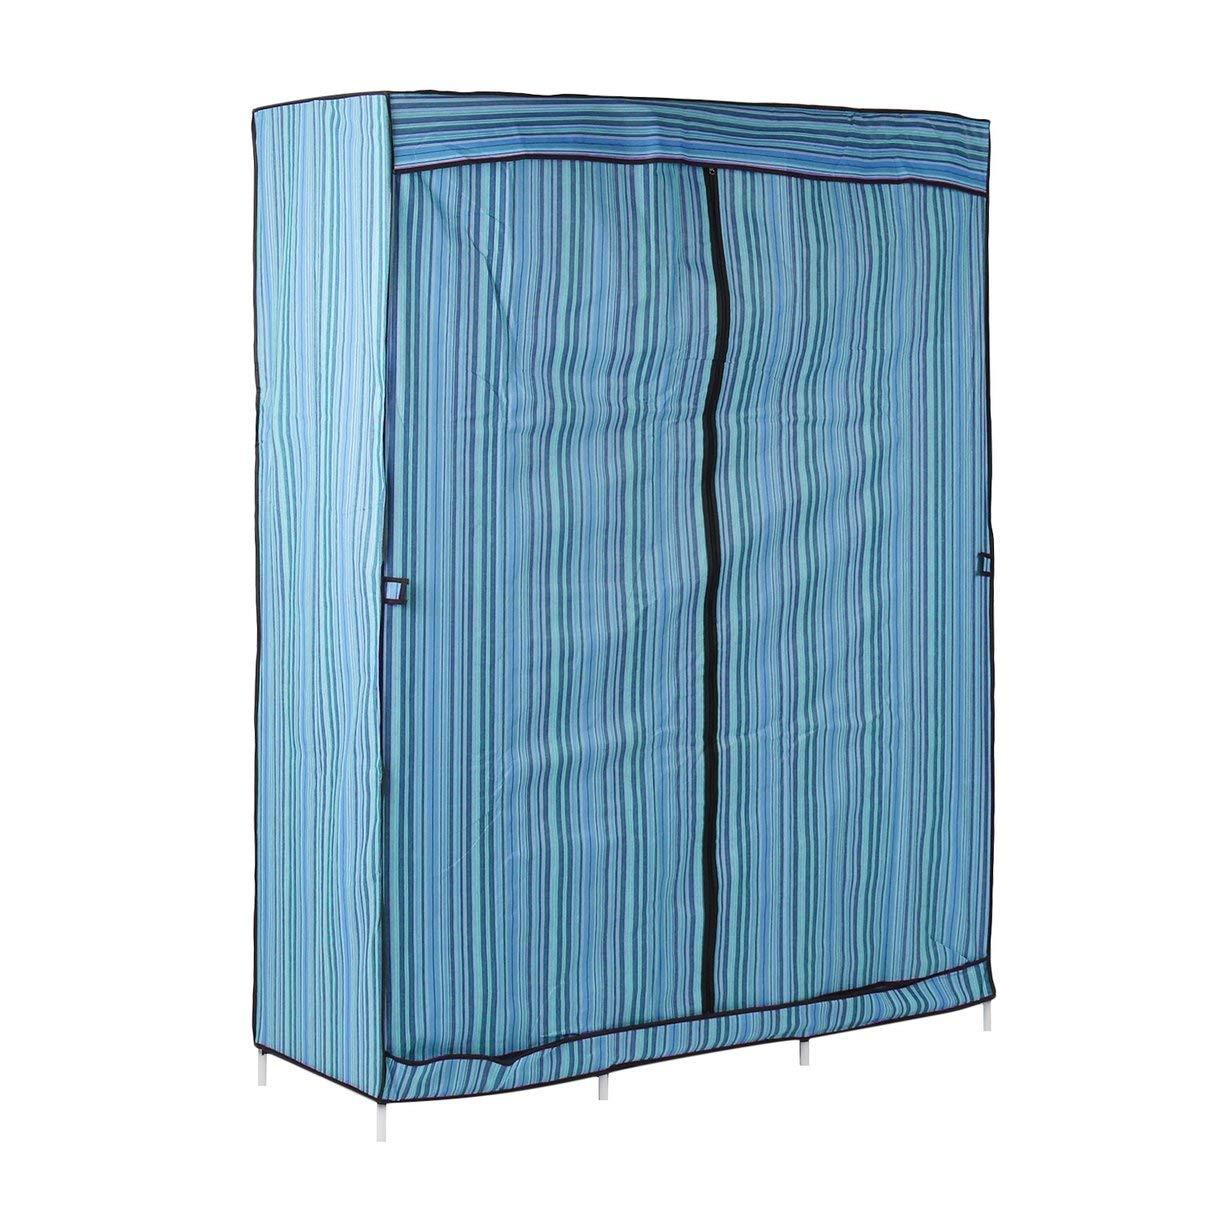 Simple Design 68 Inch +70 Inch Folding Closet Wardrobe Clothes Stainless Rack Organizer Storage Wardrobe Cabinets